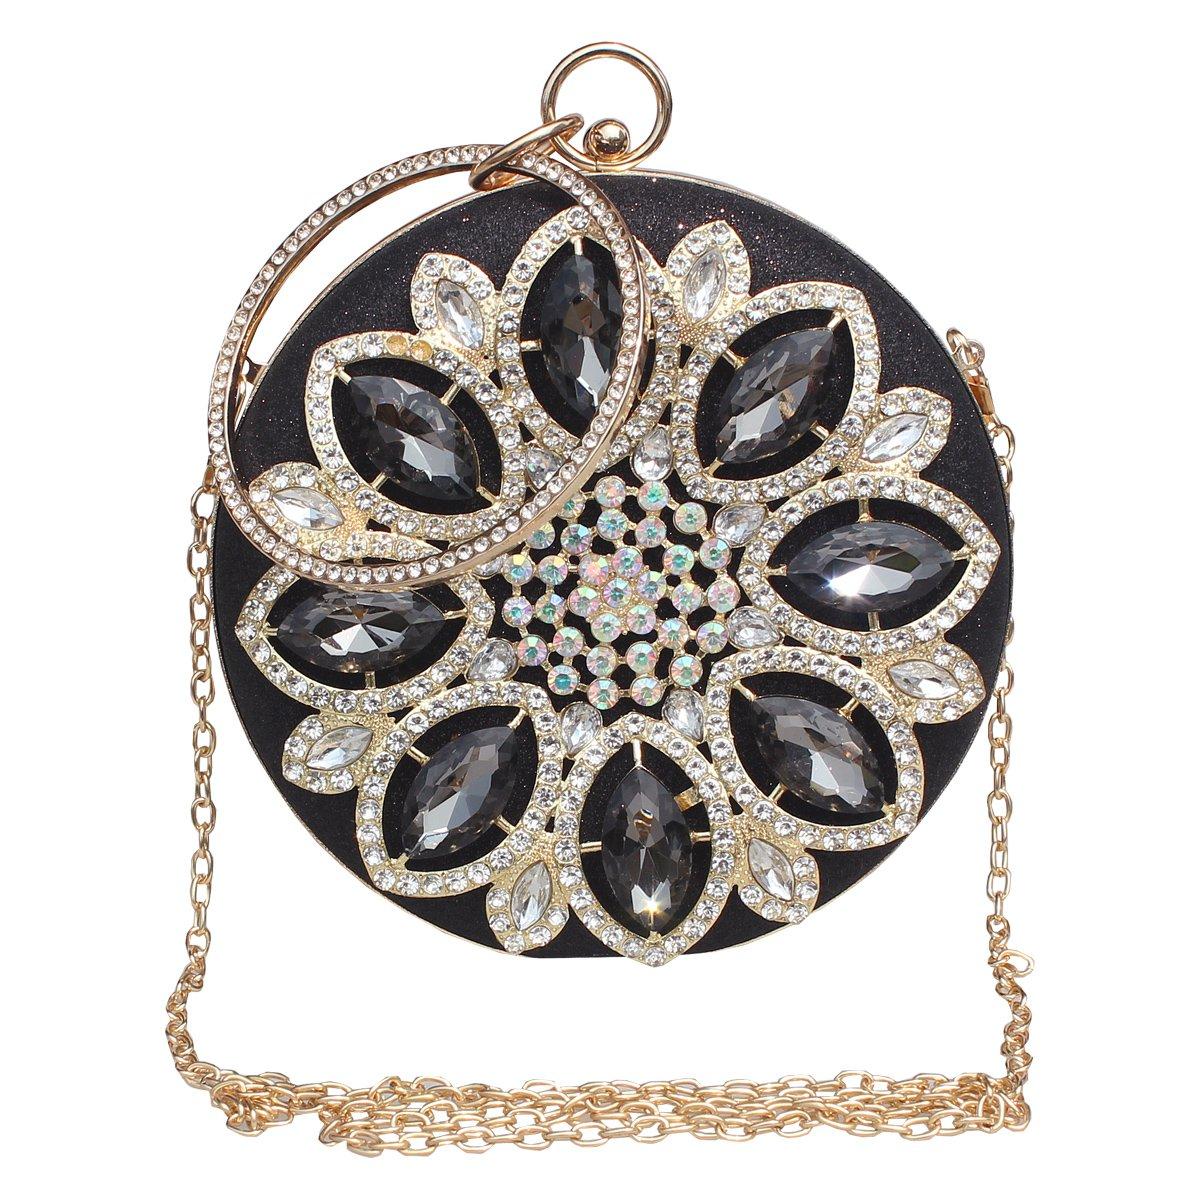 Womens Evening Bag Round Rhinestone Crystal Clutch Purse Ring Handle Handbag For Wedding and Party,Black-1.